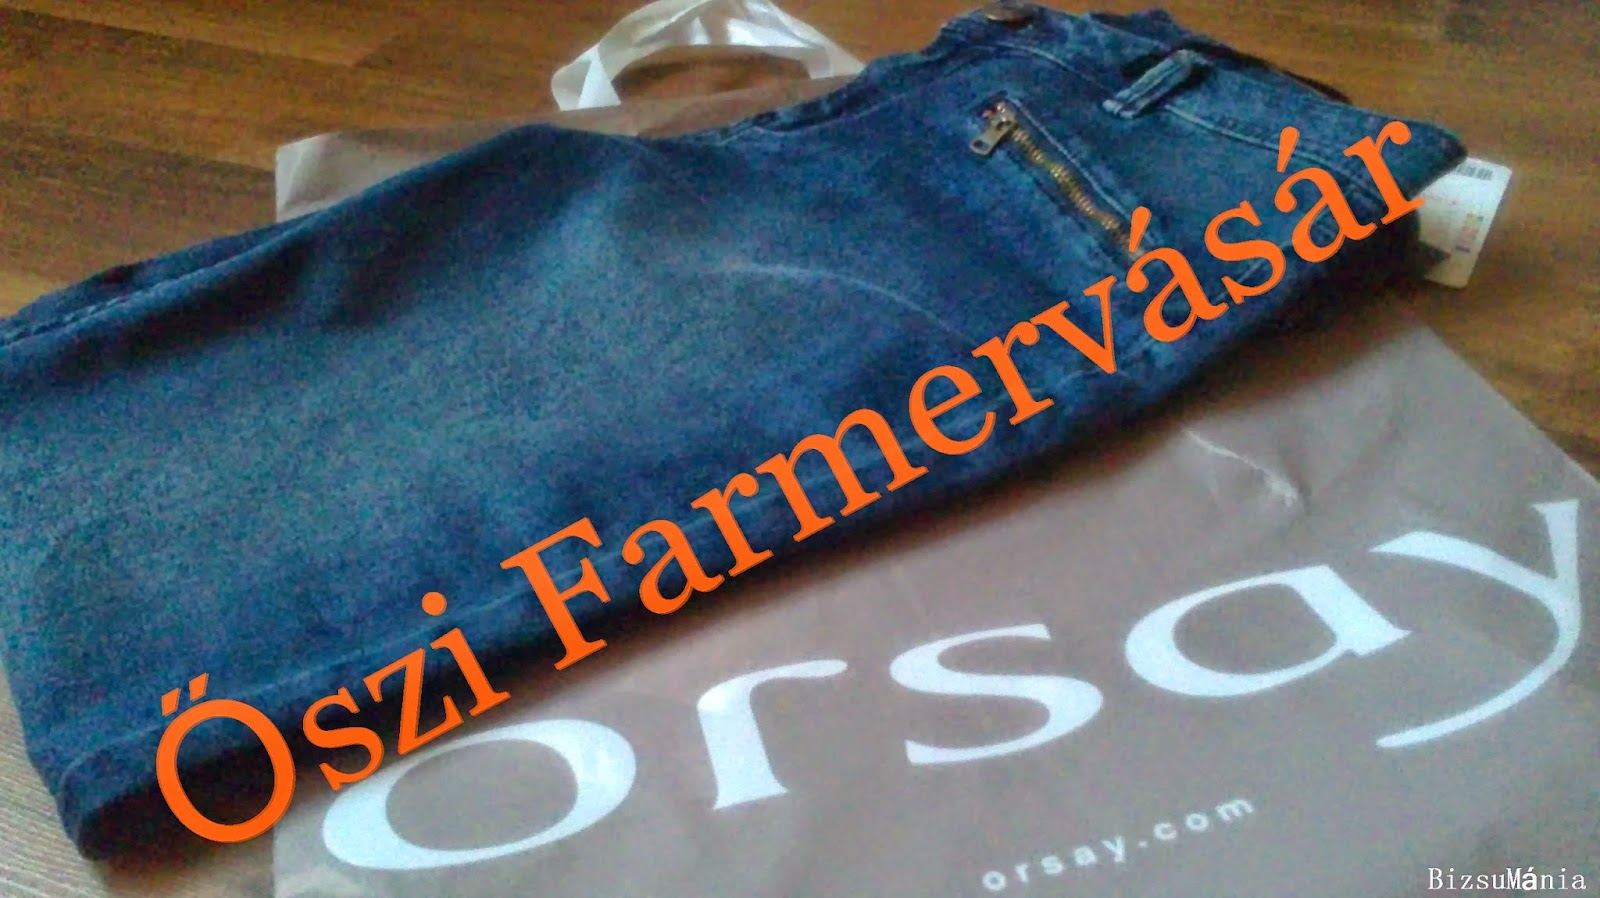 Bizsumánia  Orsay af596515ea